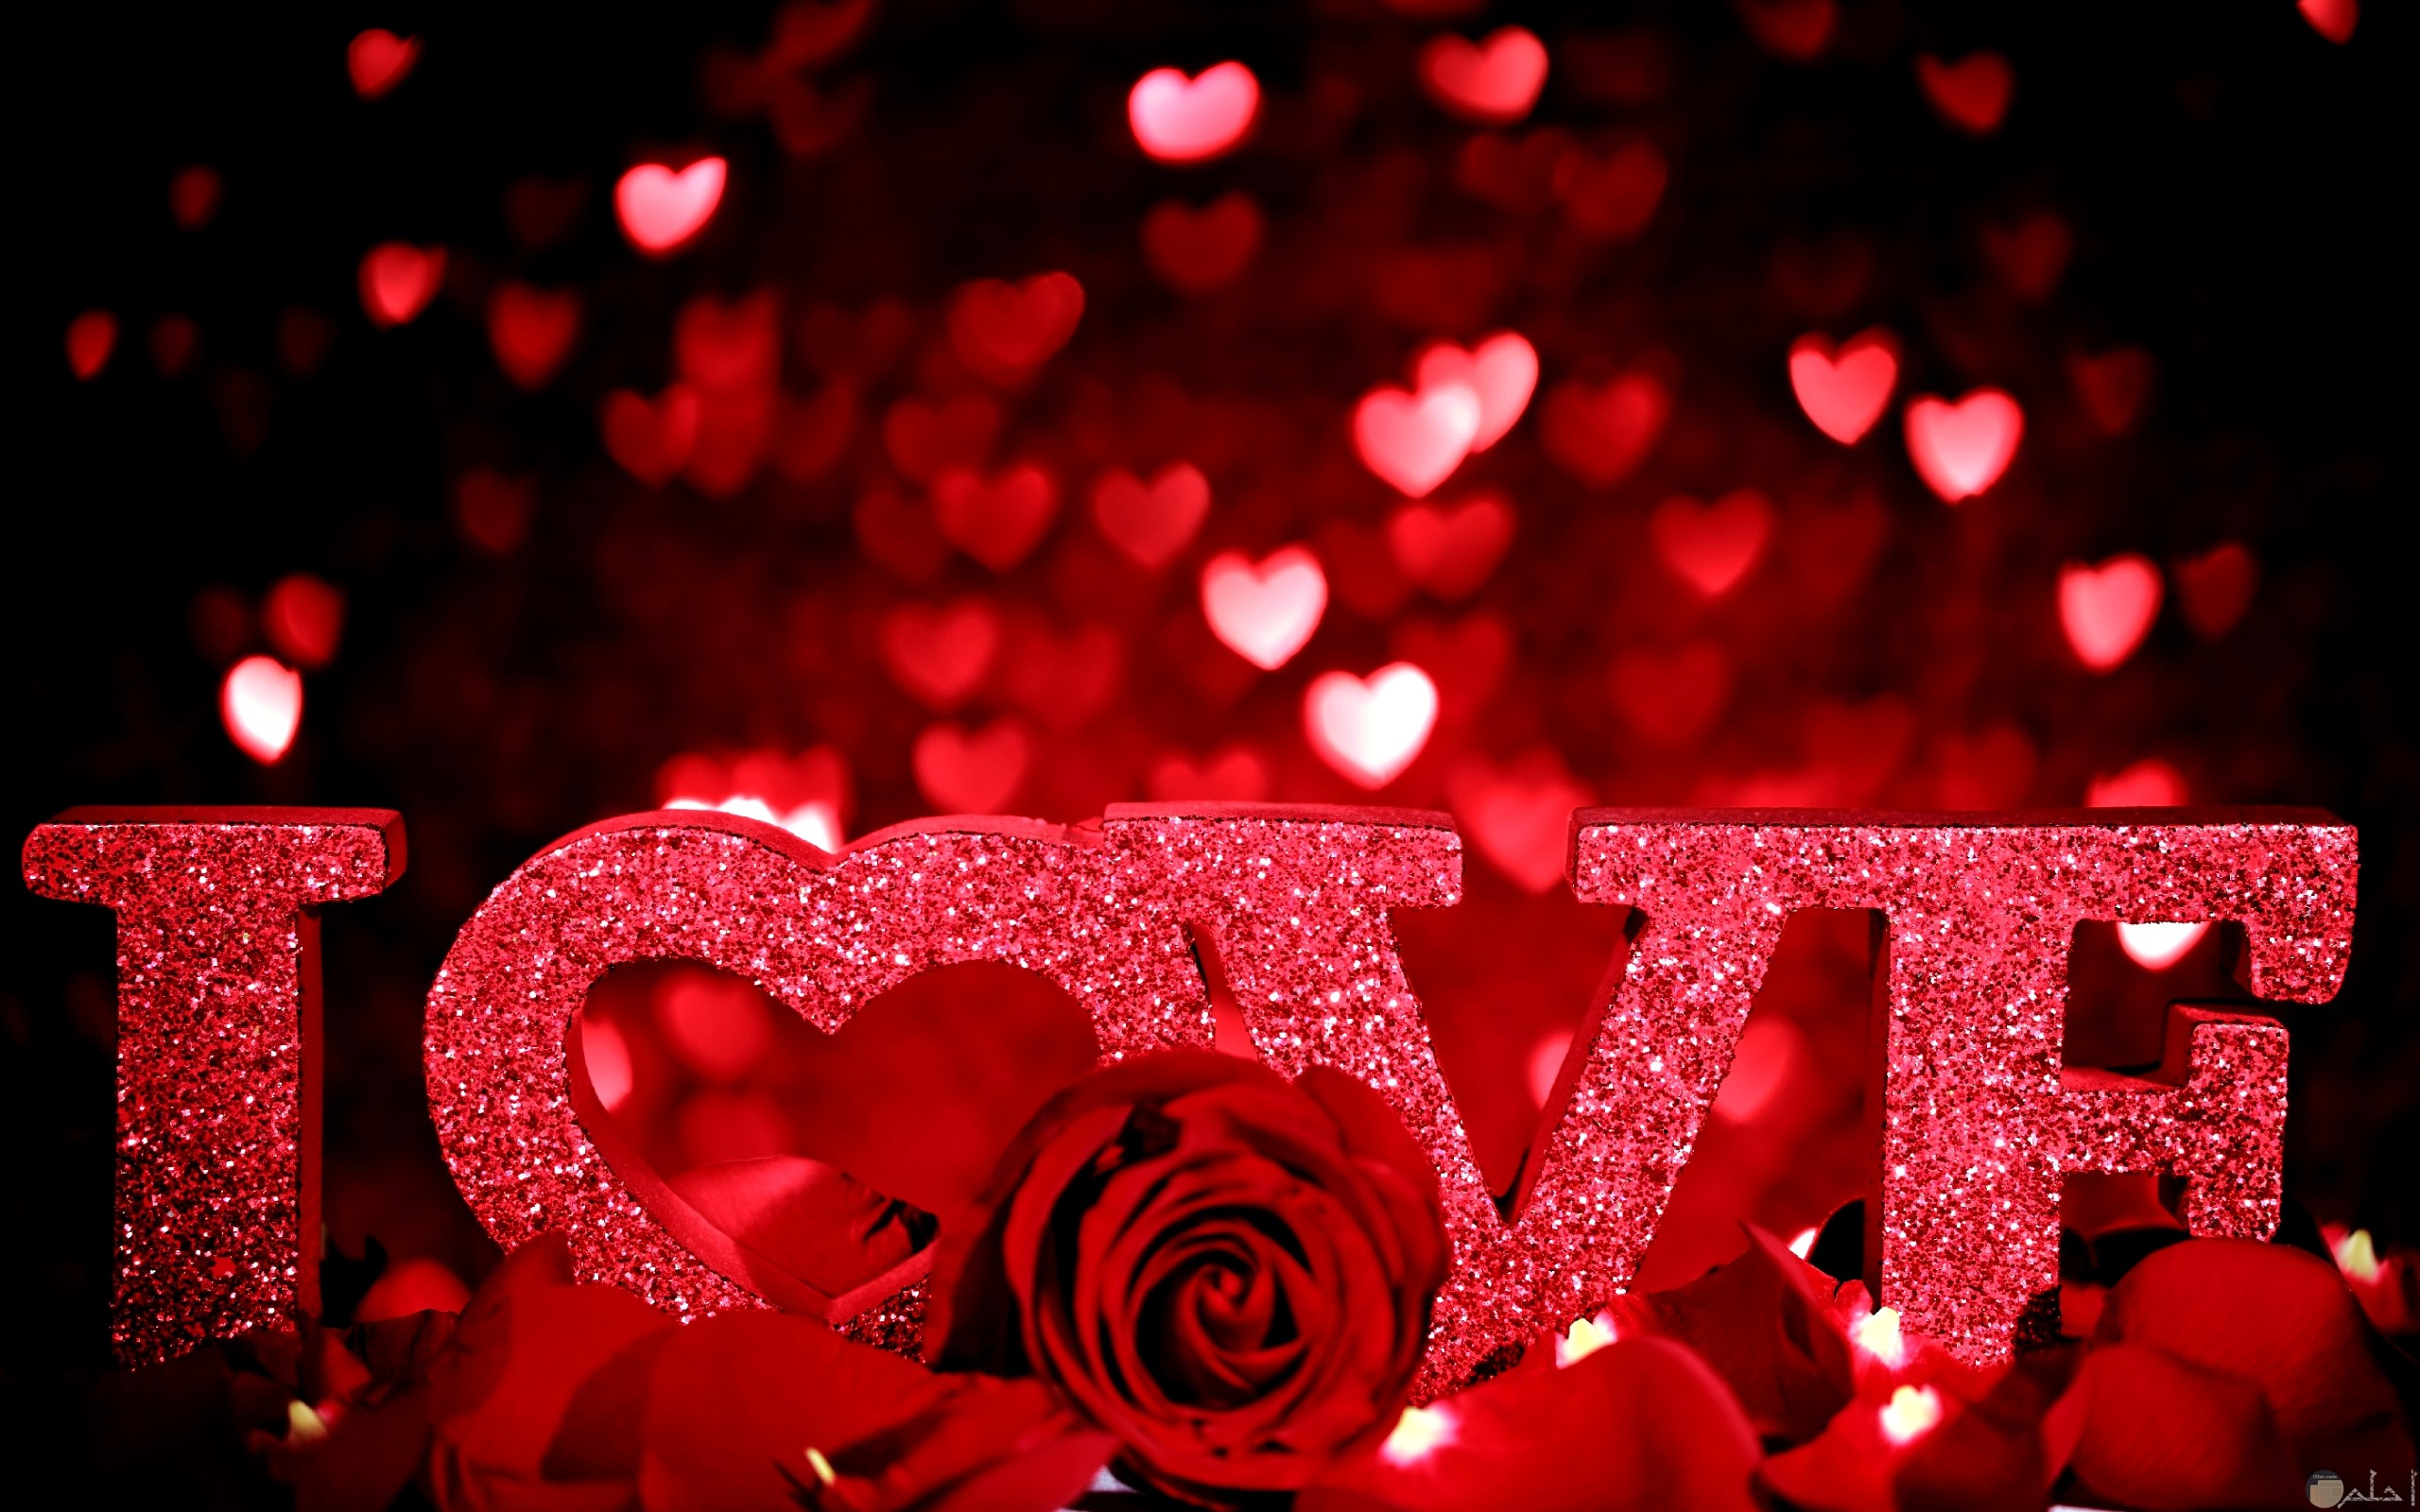 love مكتوبه بشكل جميل على خلفية حلوة